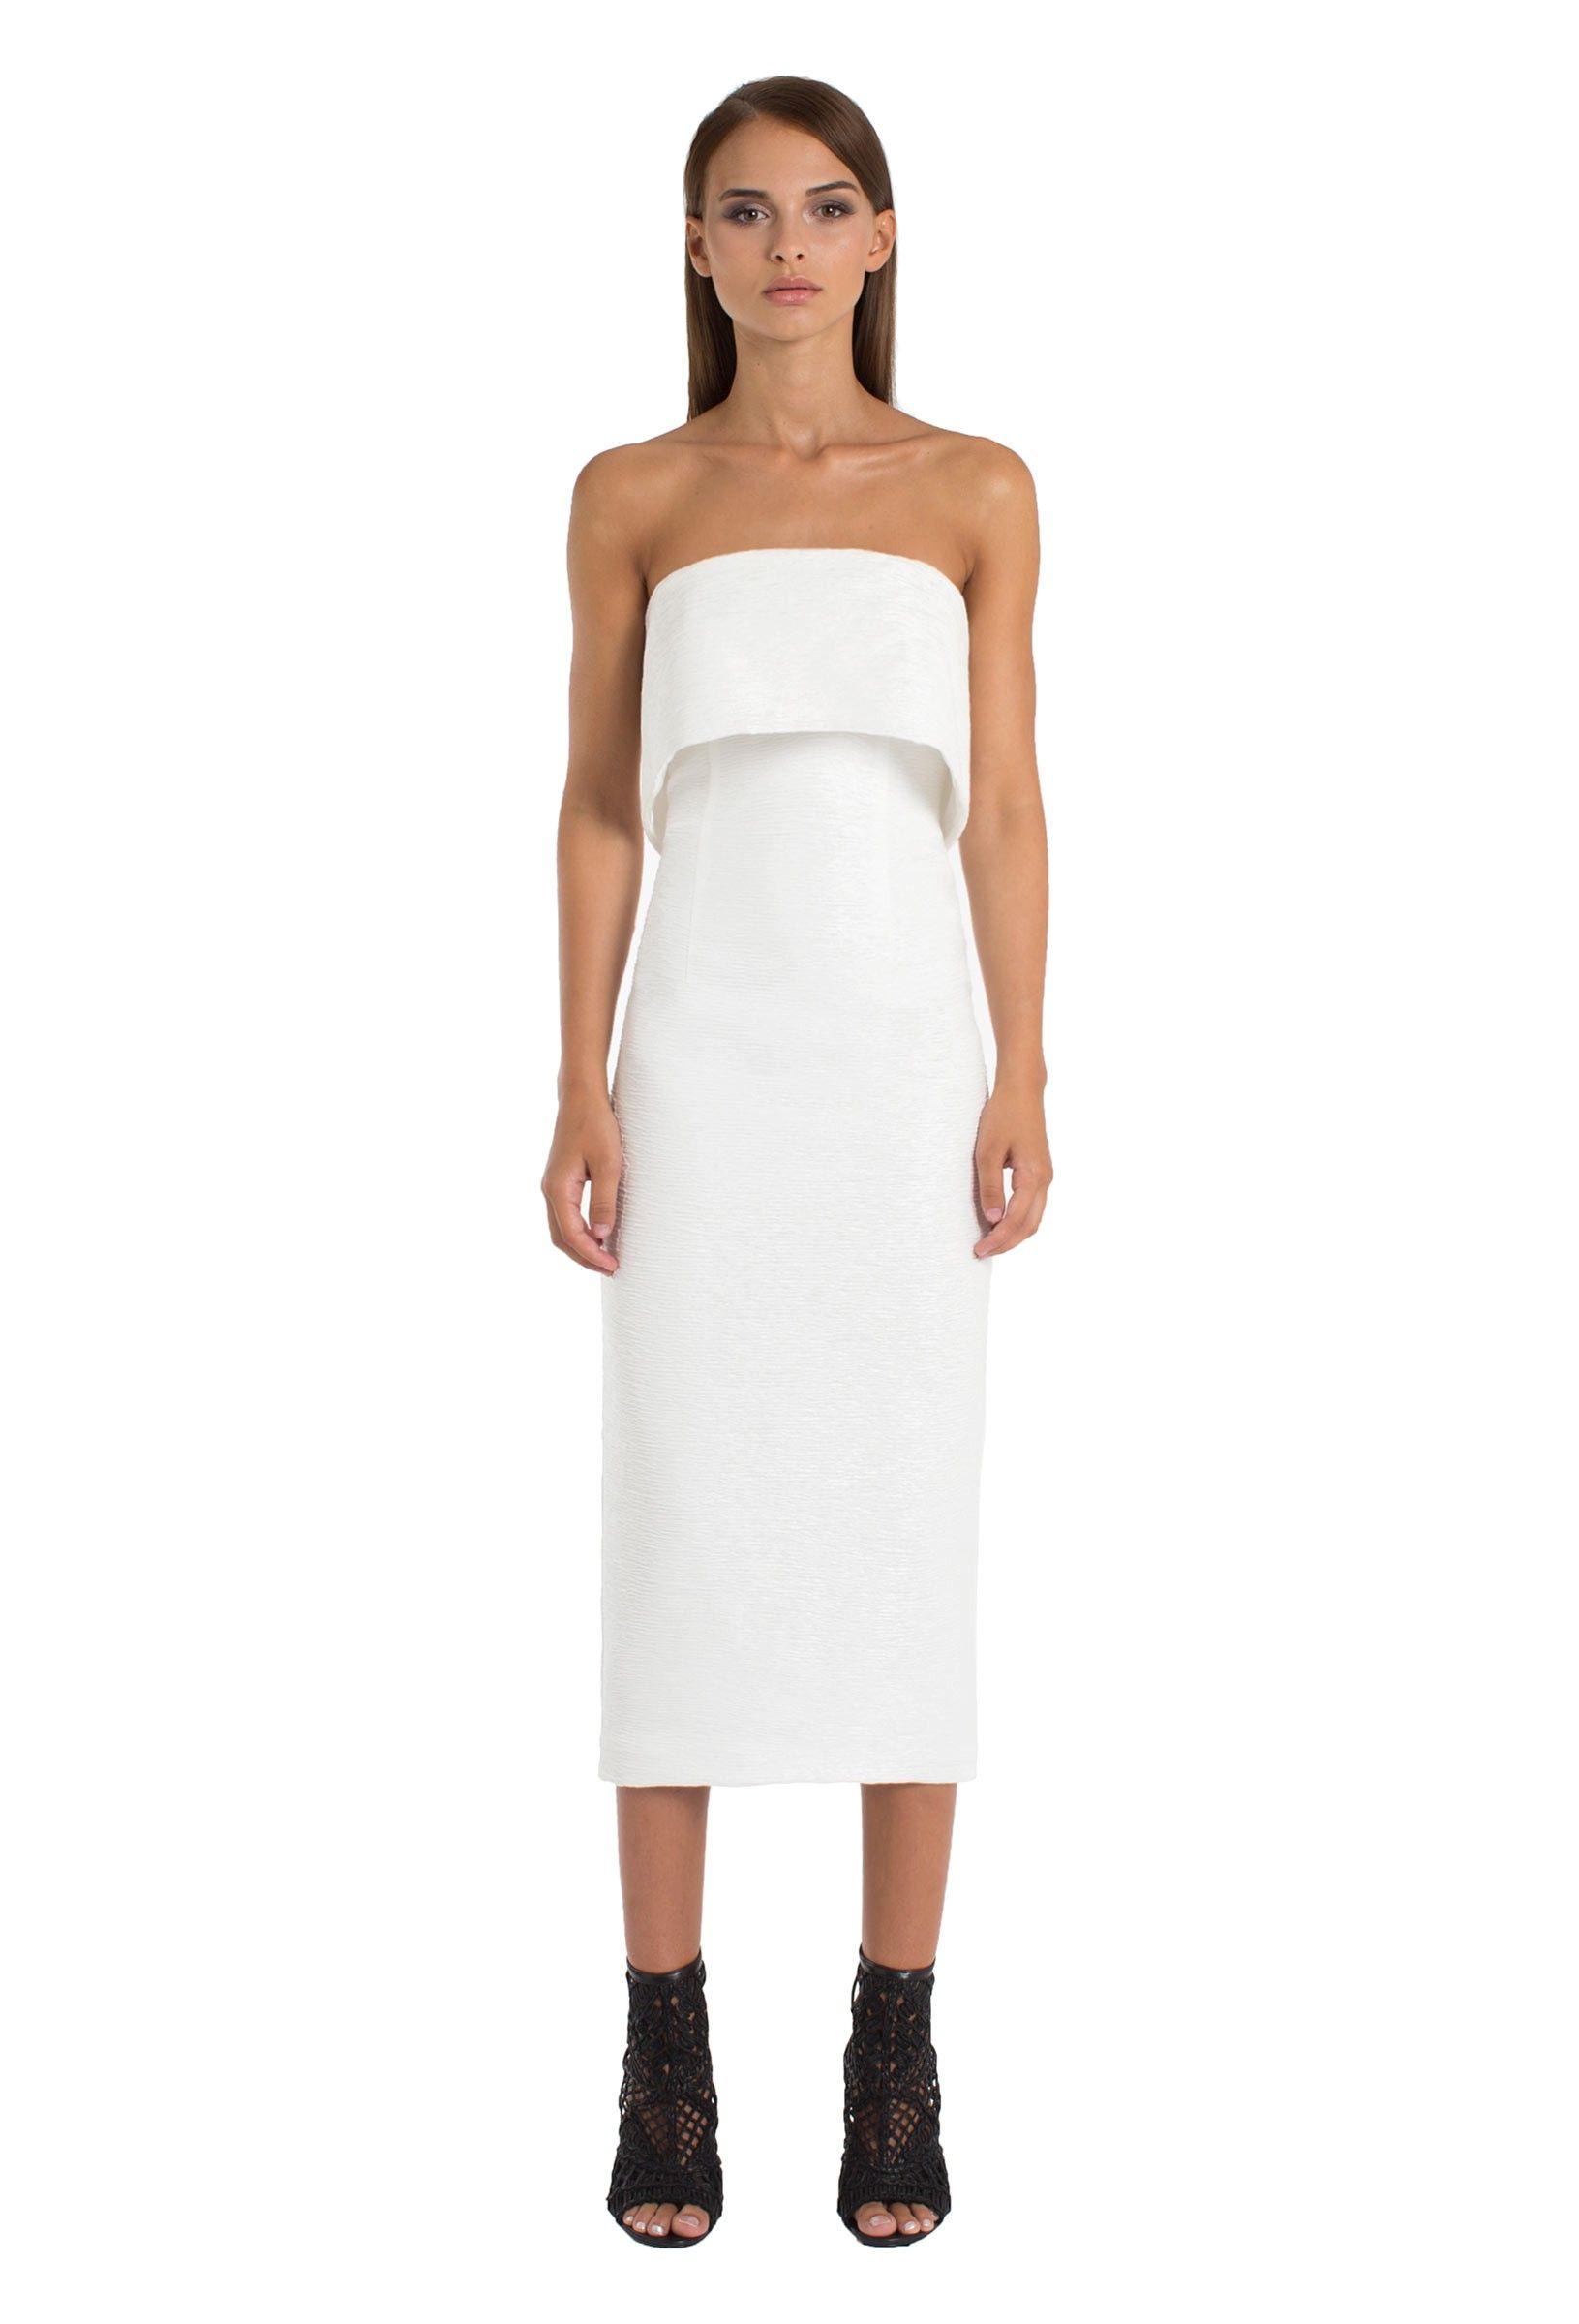 Ripple Strapless Midi Dress Cream Midi Dress Dresses Strapless Midi Dress [ 2400 x 1631 Pixel ]